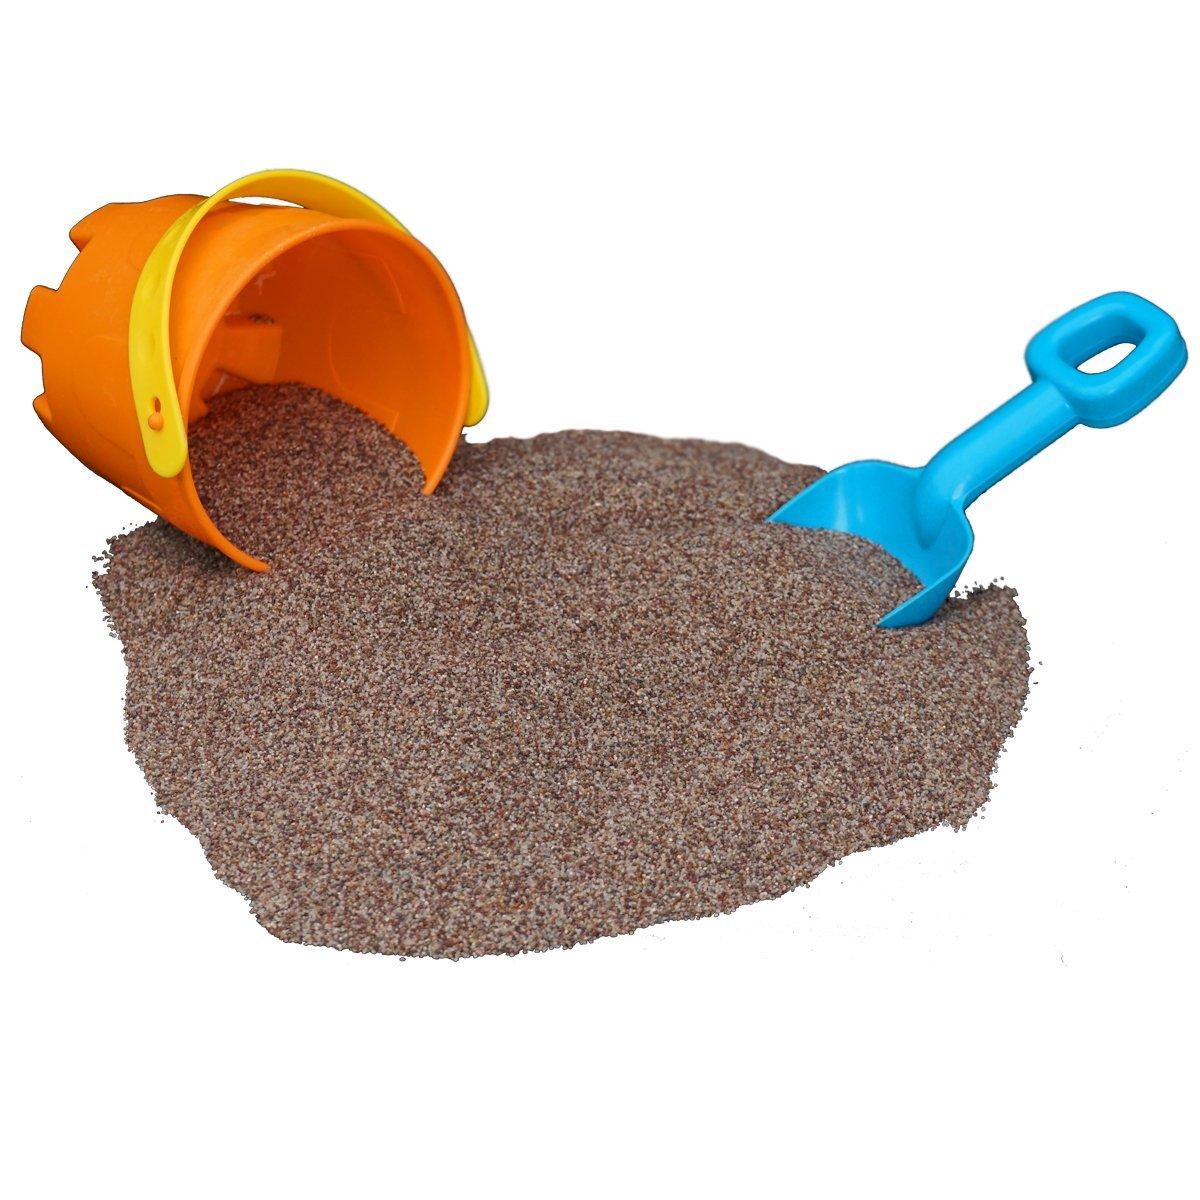 Jurassic RiverBed Play Sand - 25 Pound Sandbox Sand